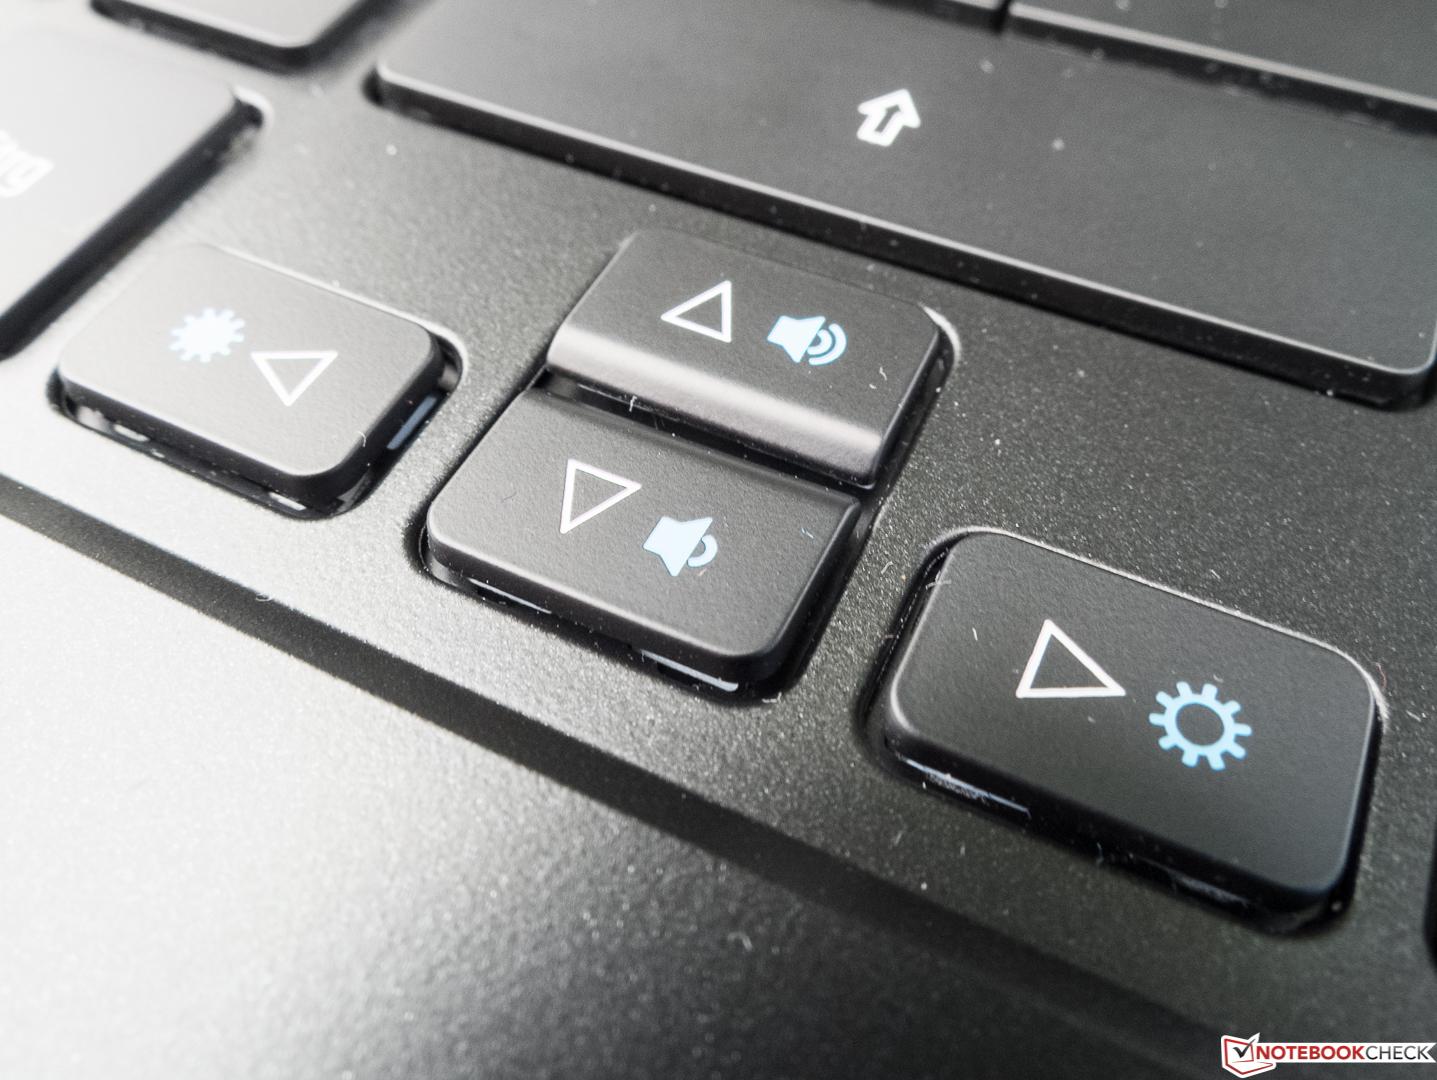 Acer TravelMate P658-M Intel Thunderbolt Mac